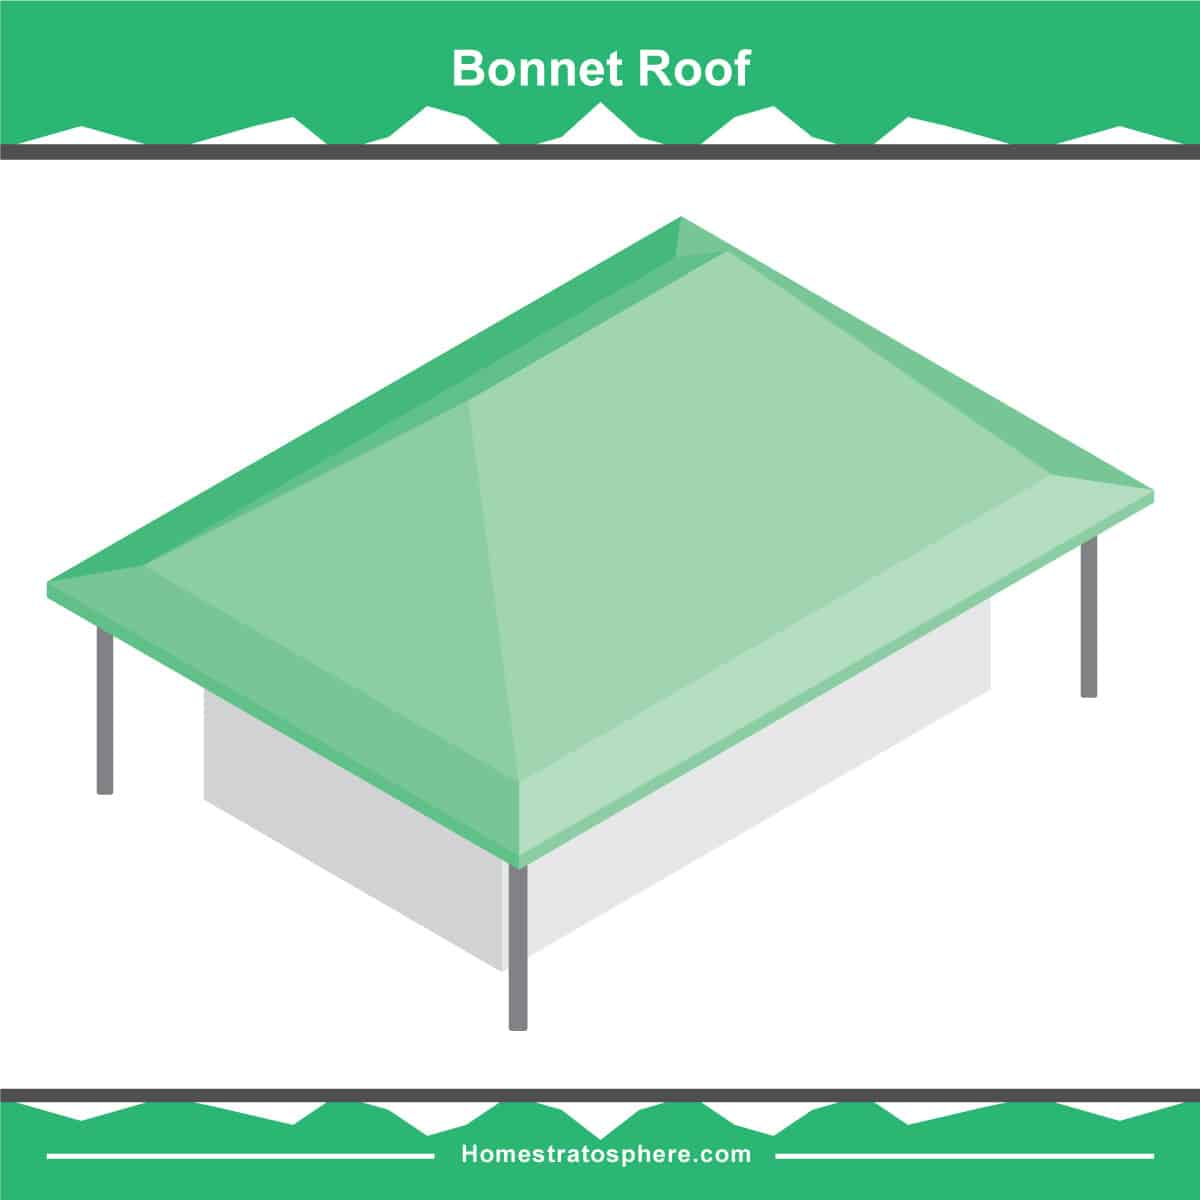 Bonnet roof illustration